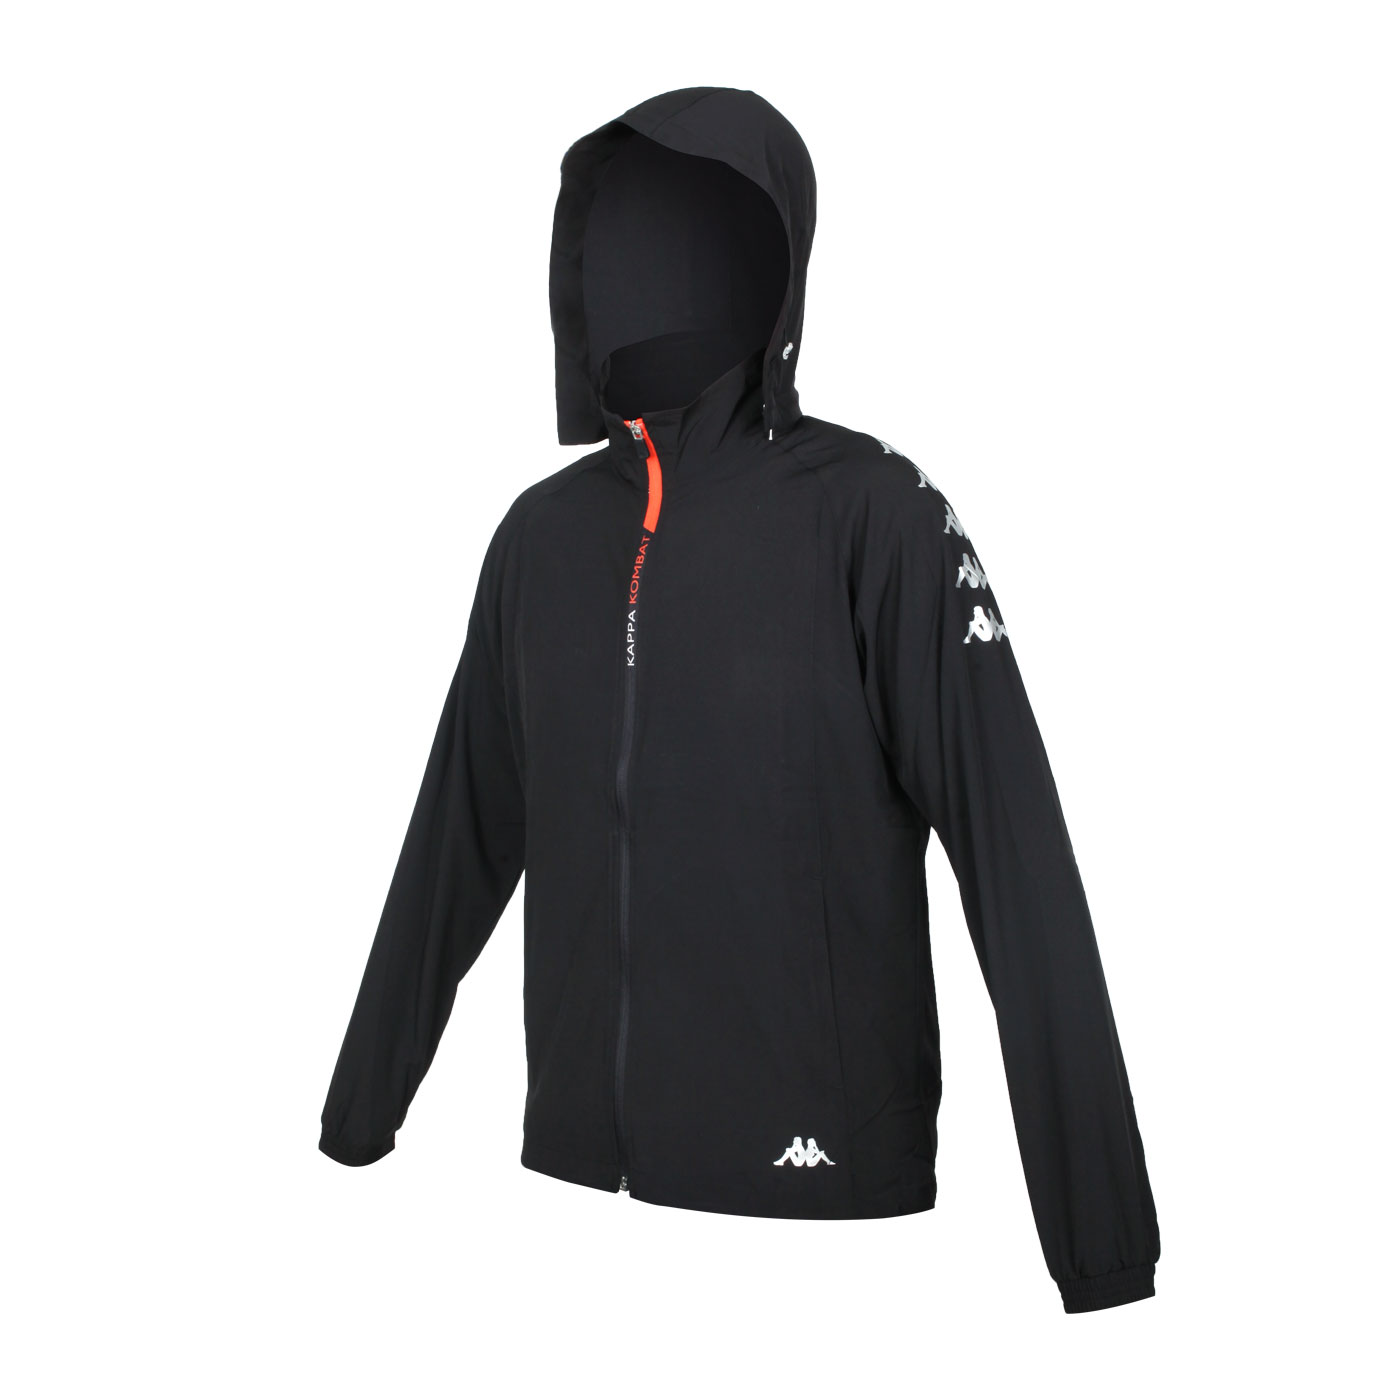 KAPPA 男款K4T單層風衣 37168MW-005 - 黑白橘